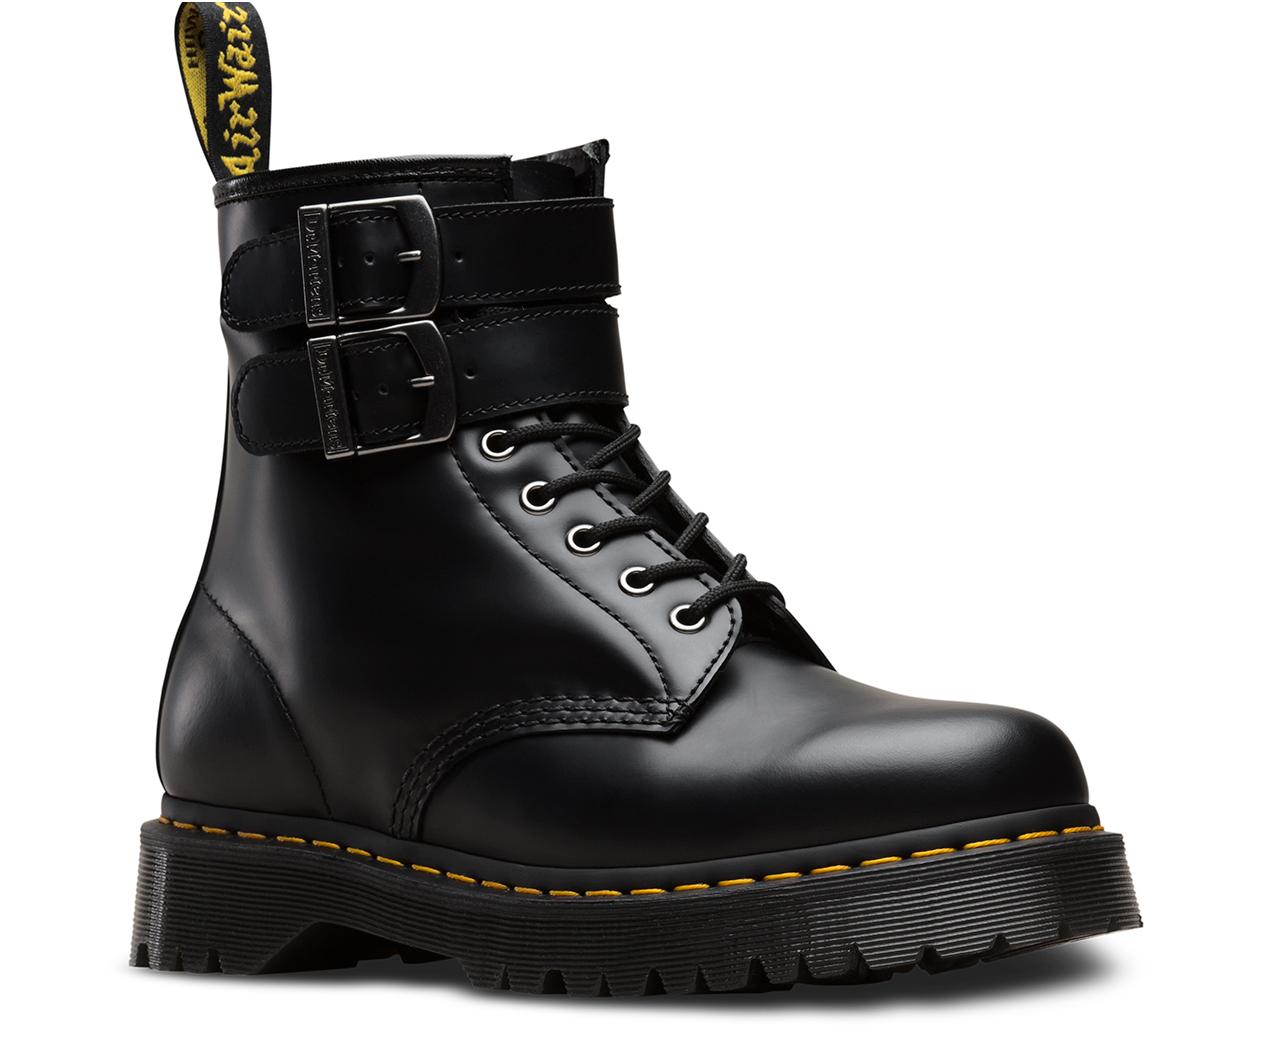 dec2817b5c 1460 ALT | 1460 Boots | Dr. Martens Official